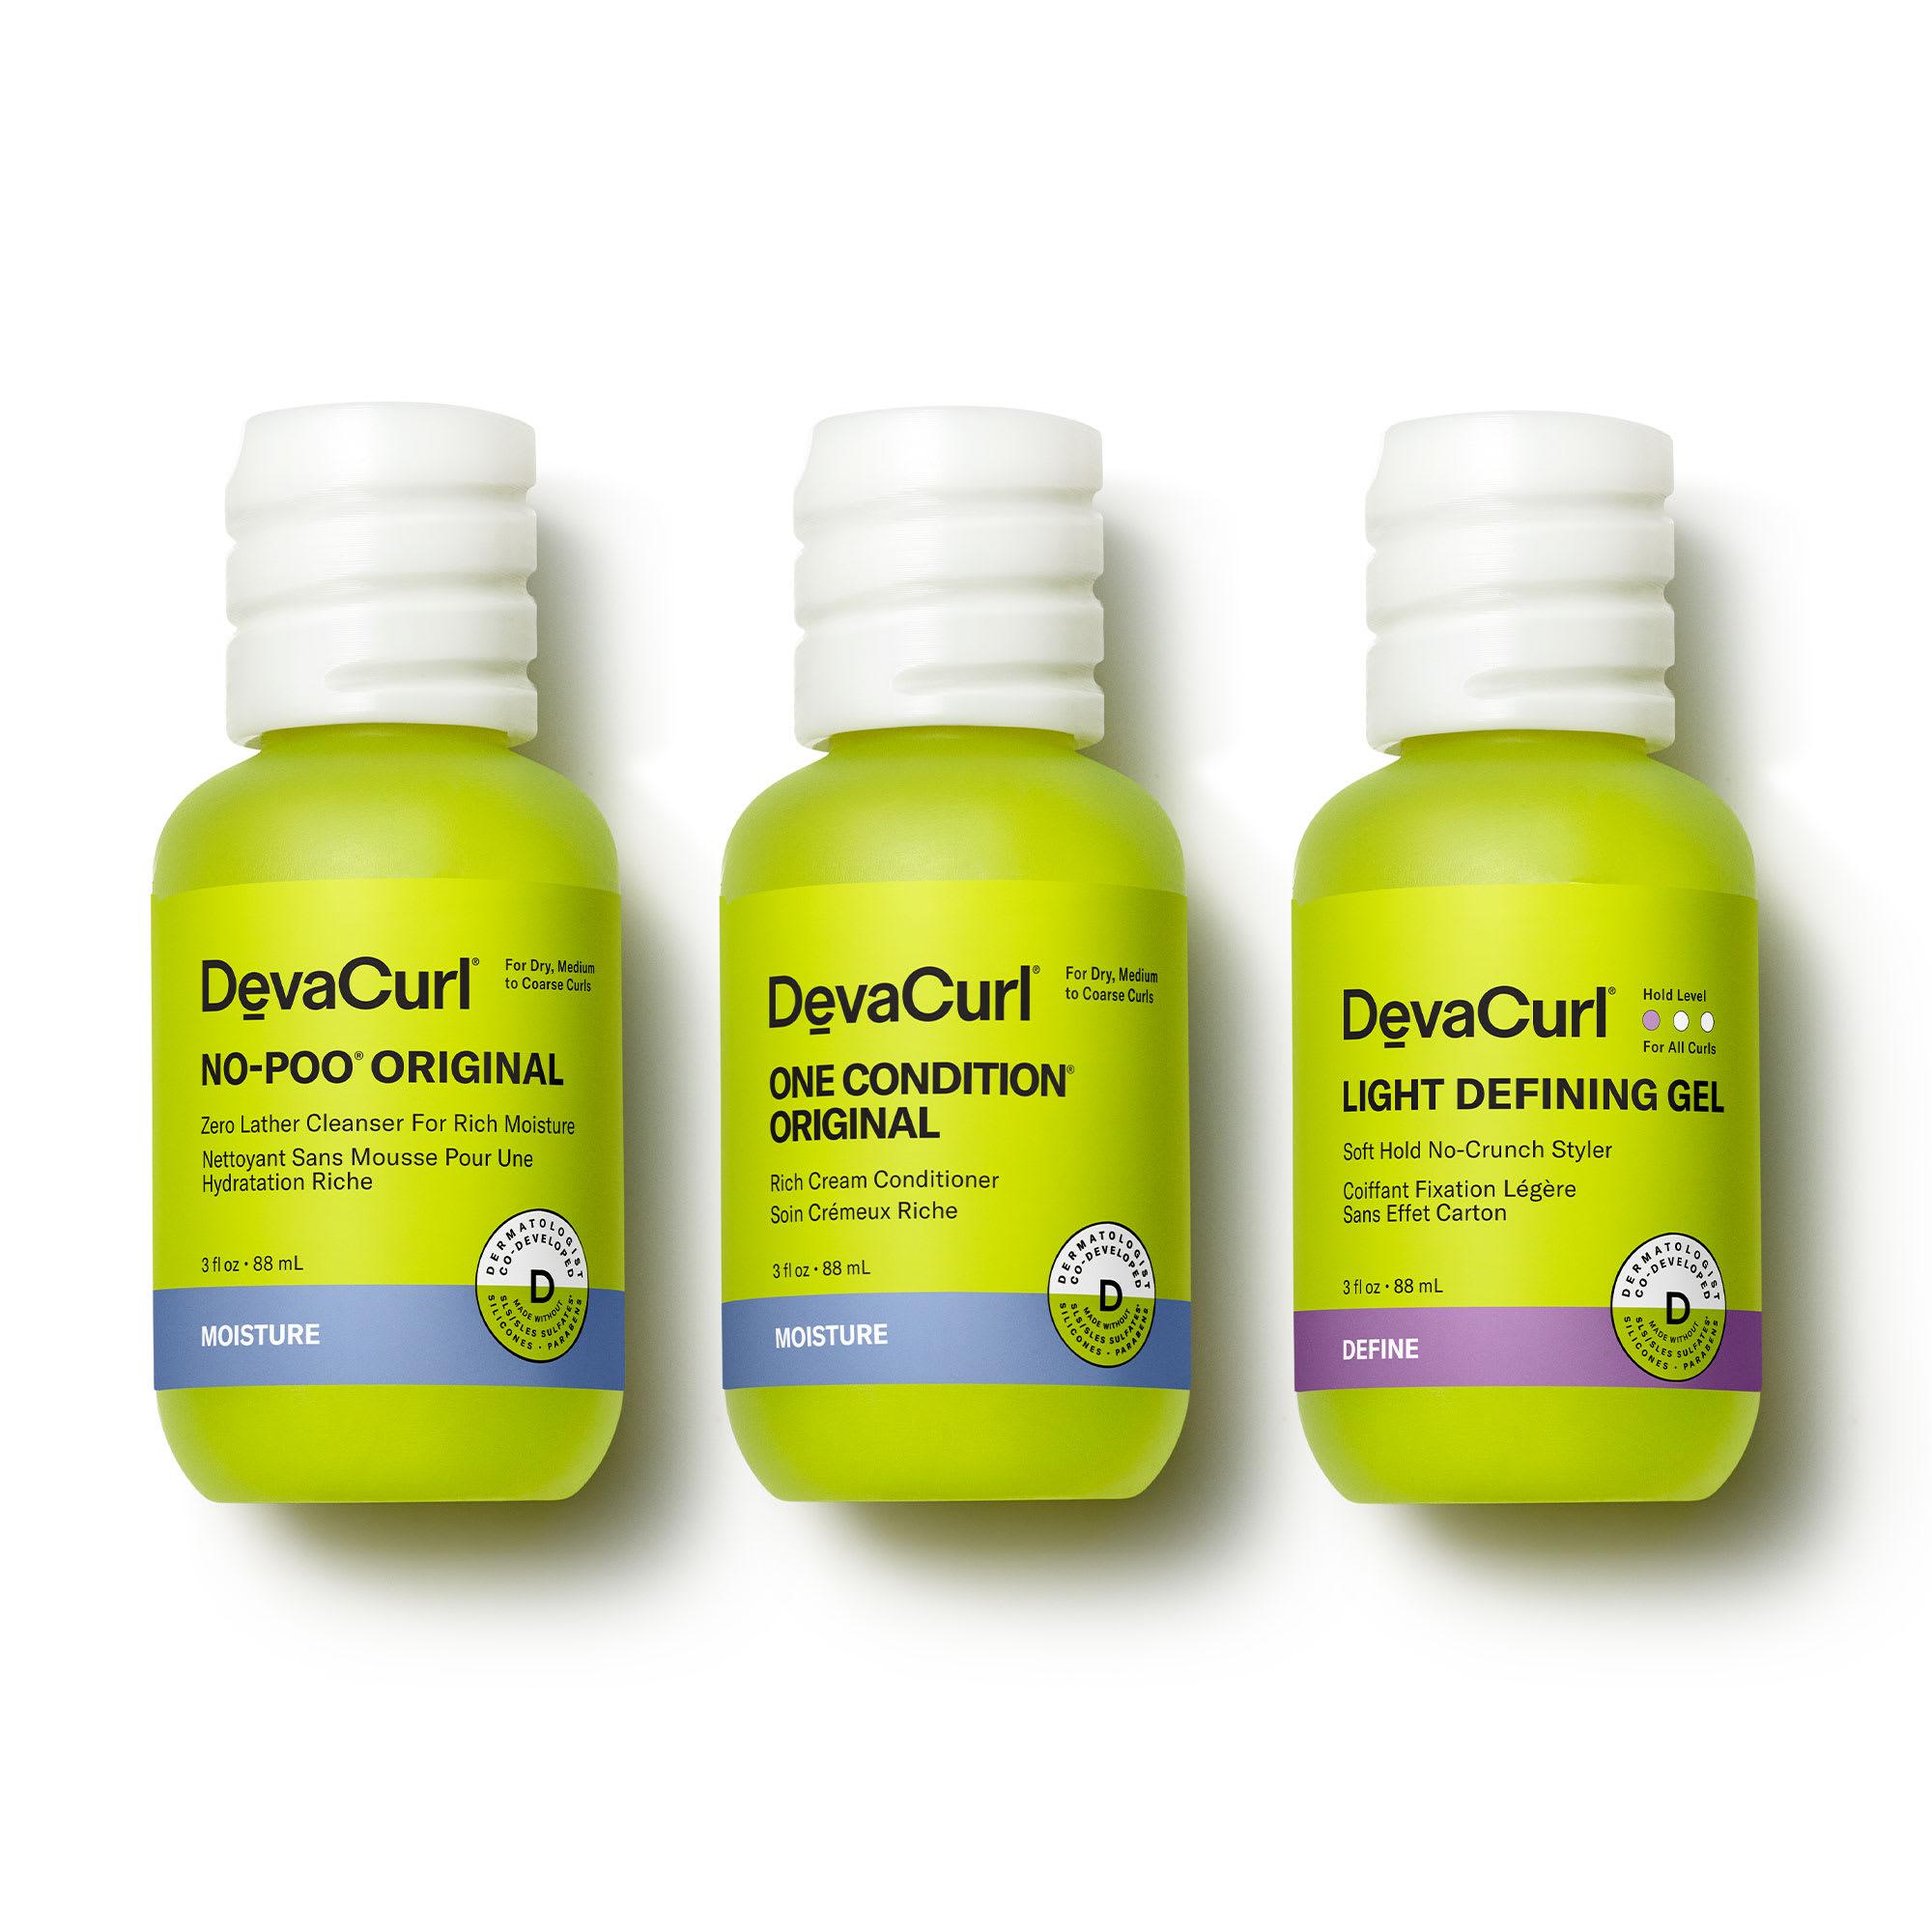 No-Poo Original, One Condition Original and Ultra Defining Gel 3oz bottles